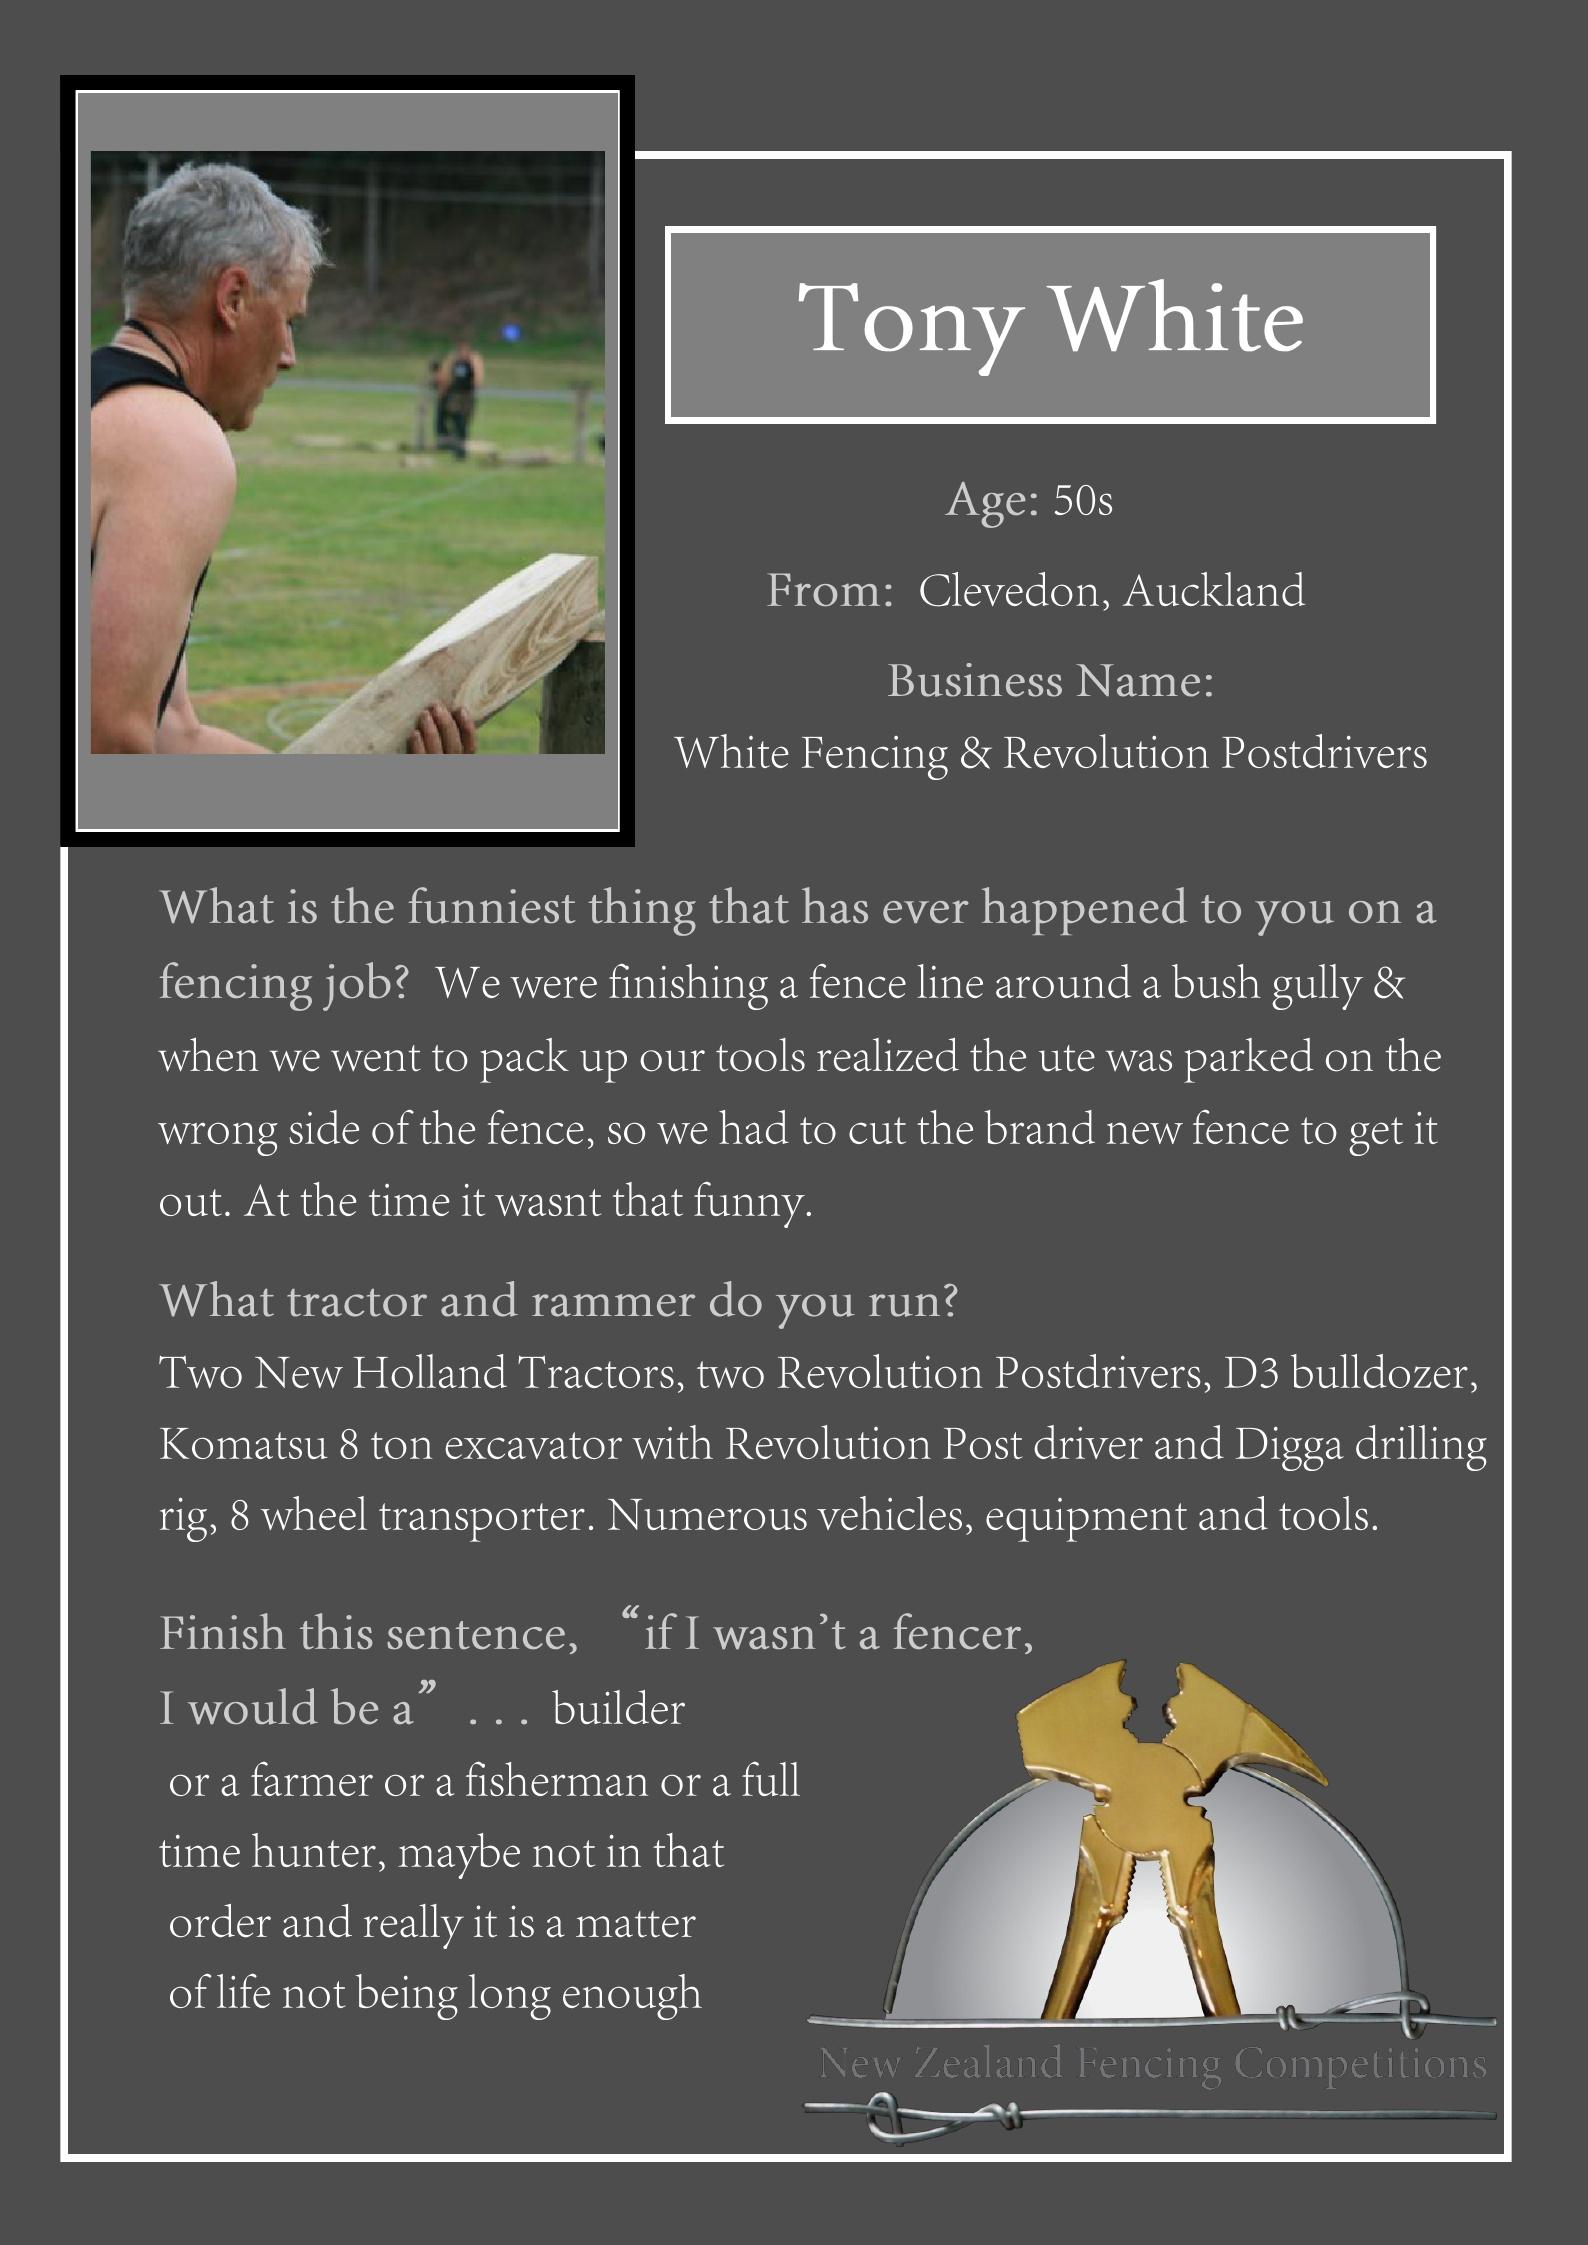 Tony White